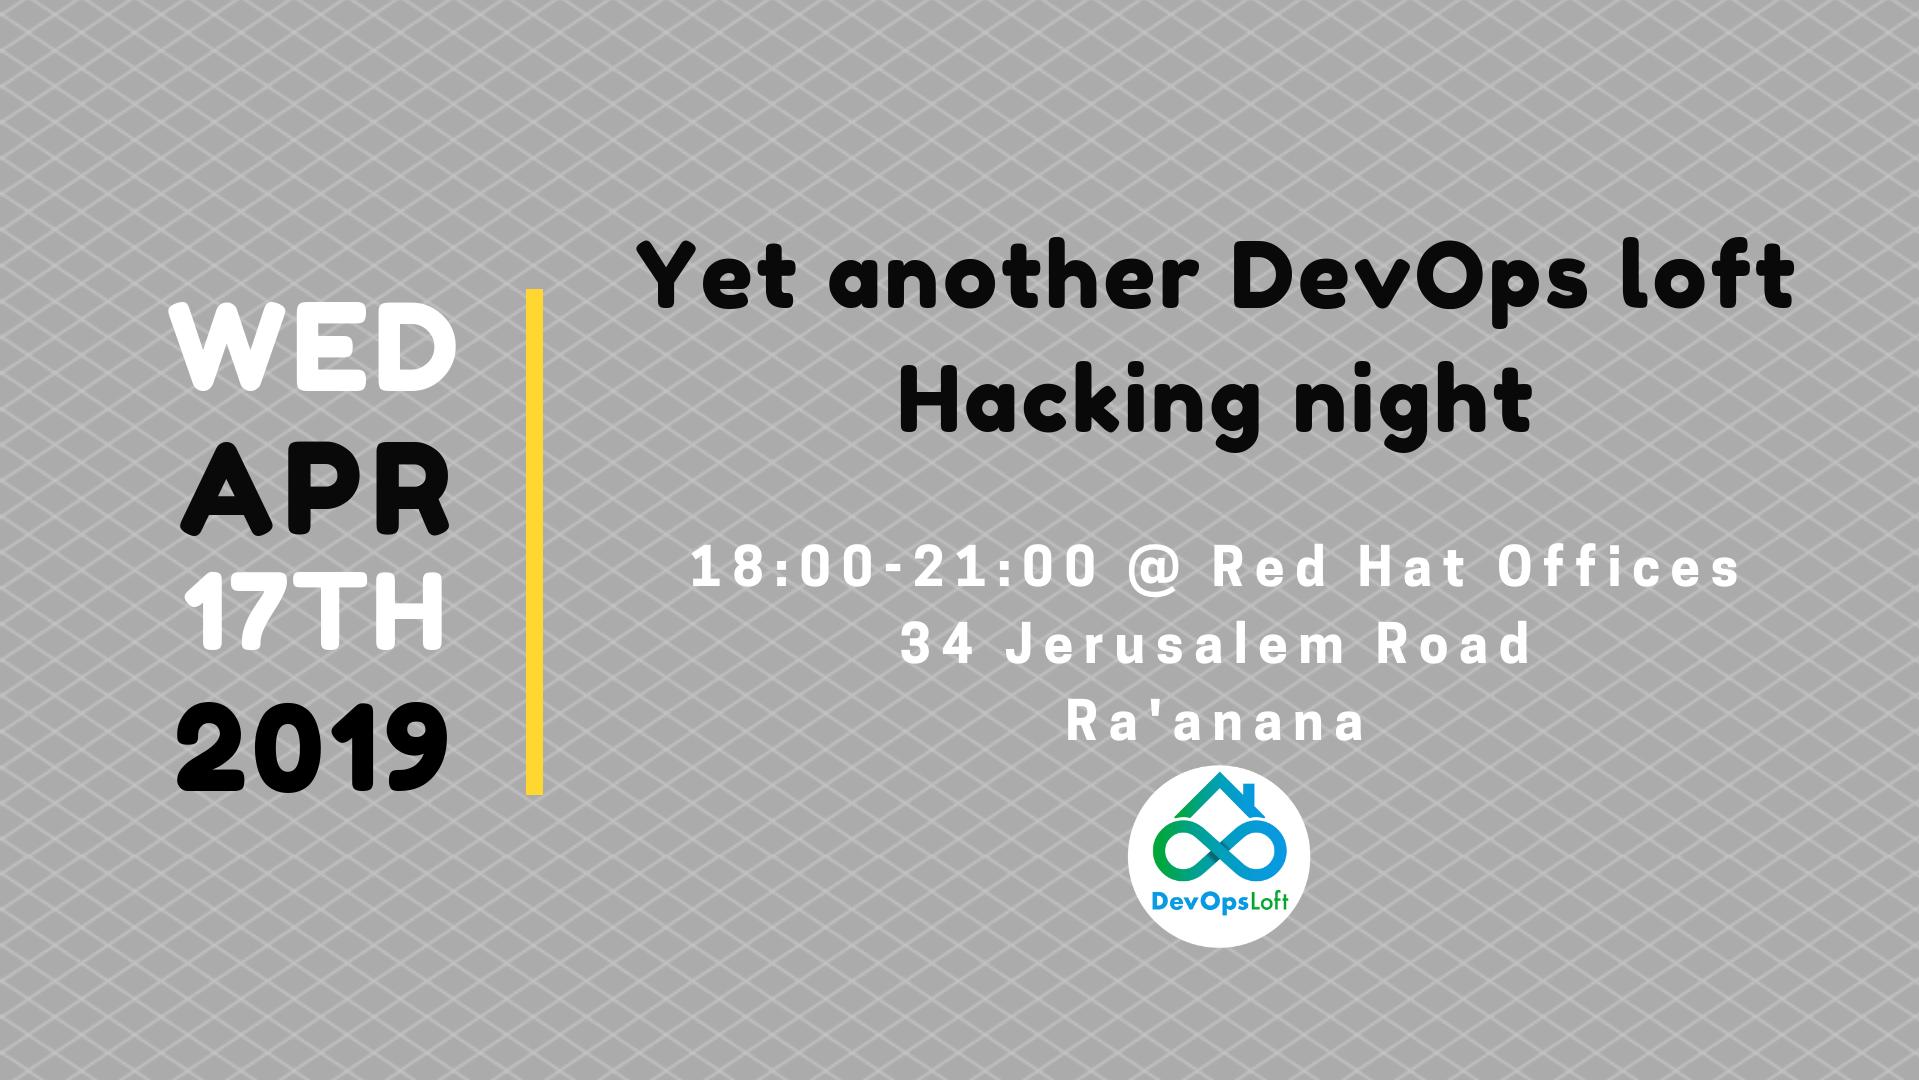 Yet another DevOps Loft hacking night